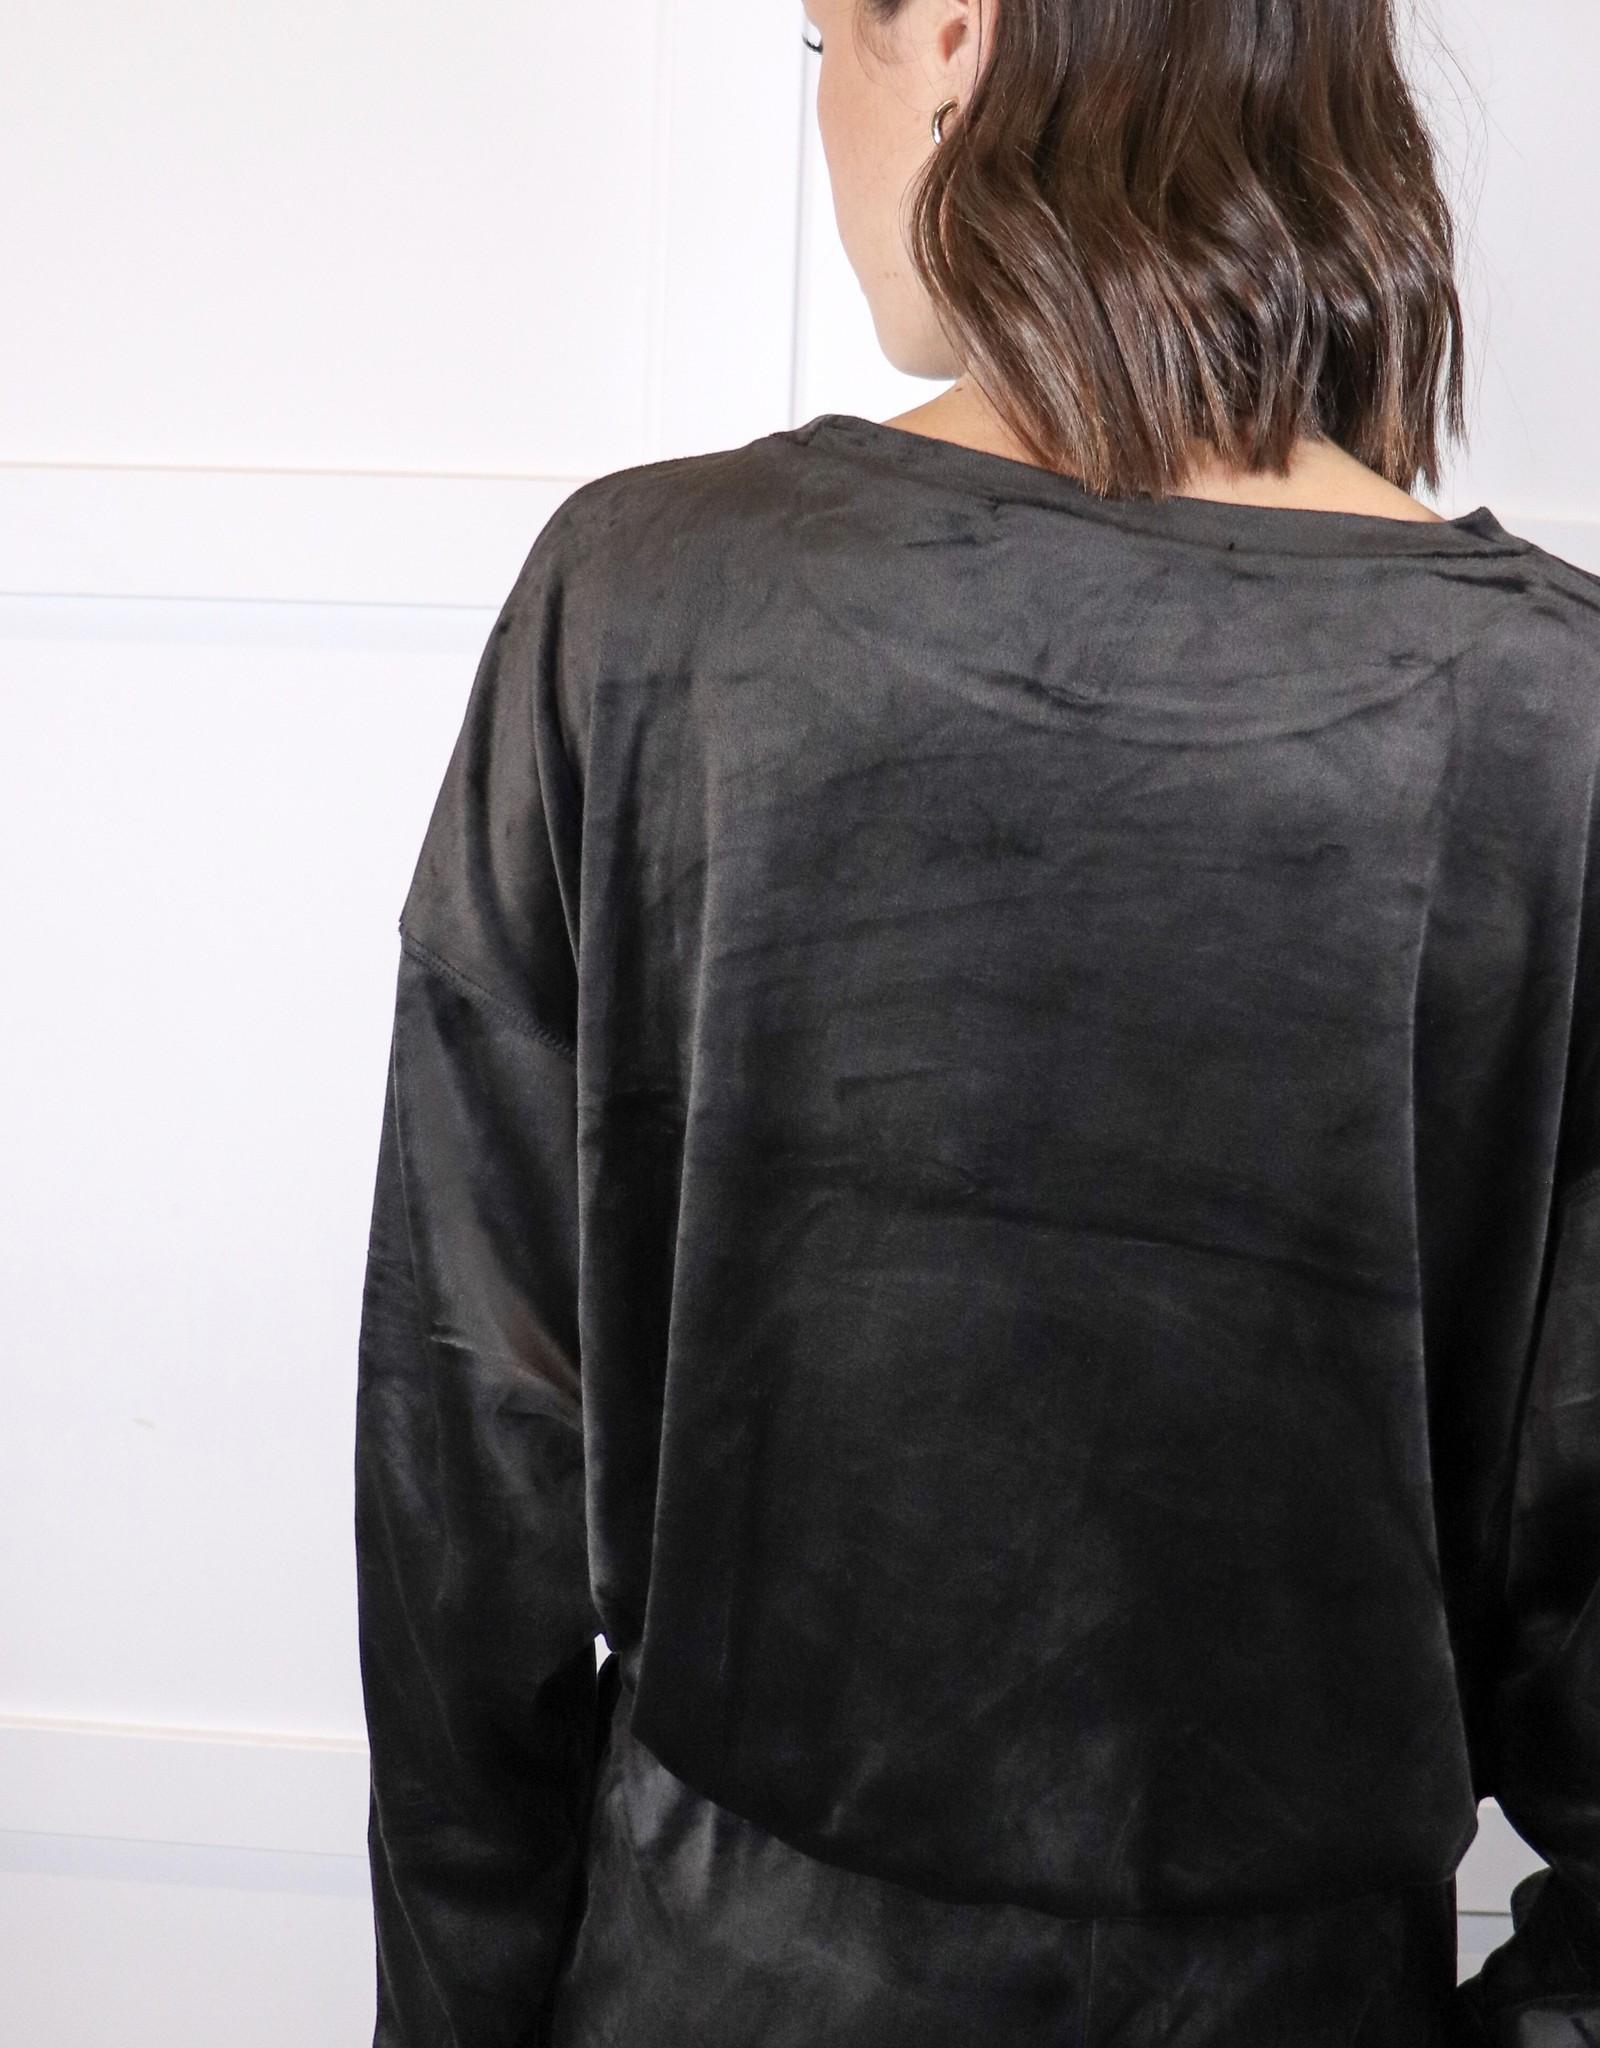 HUSH Drawstring btm velour sweater